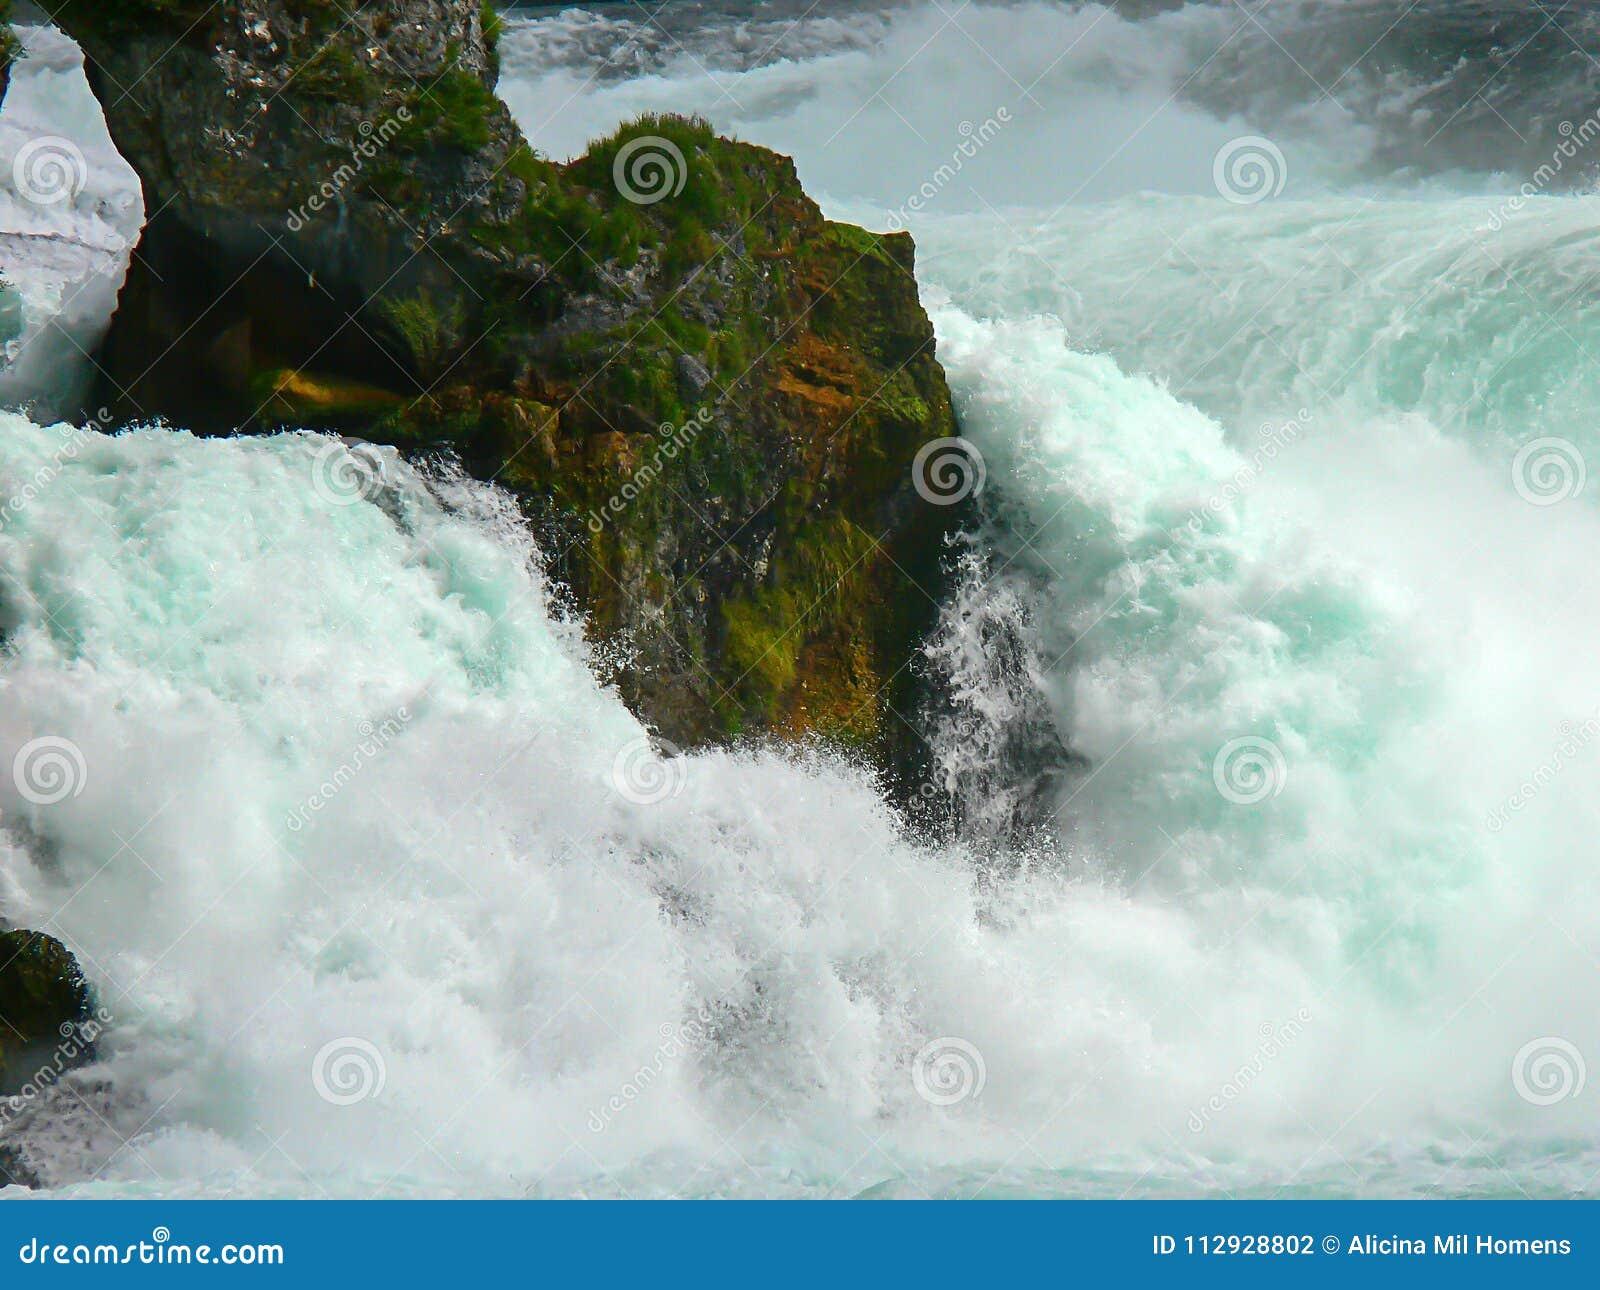 Watervallen Van Schaffhausen Zwitserland.Schaffhausen De Grootste Watervallen In Europa Stock Foto